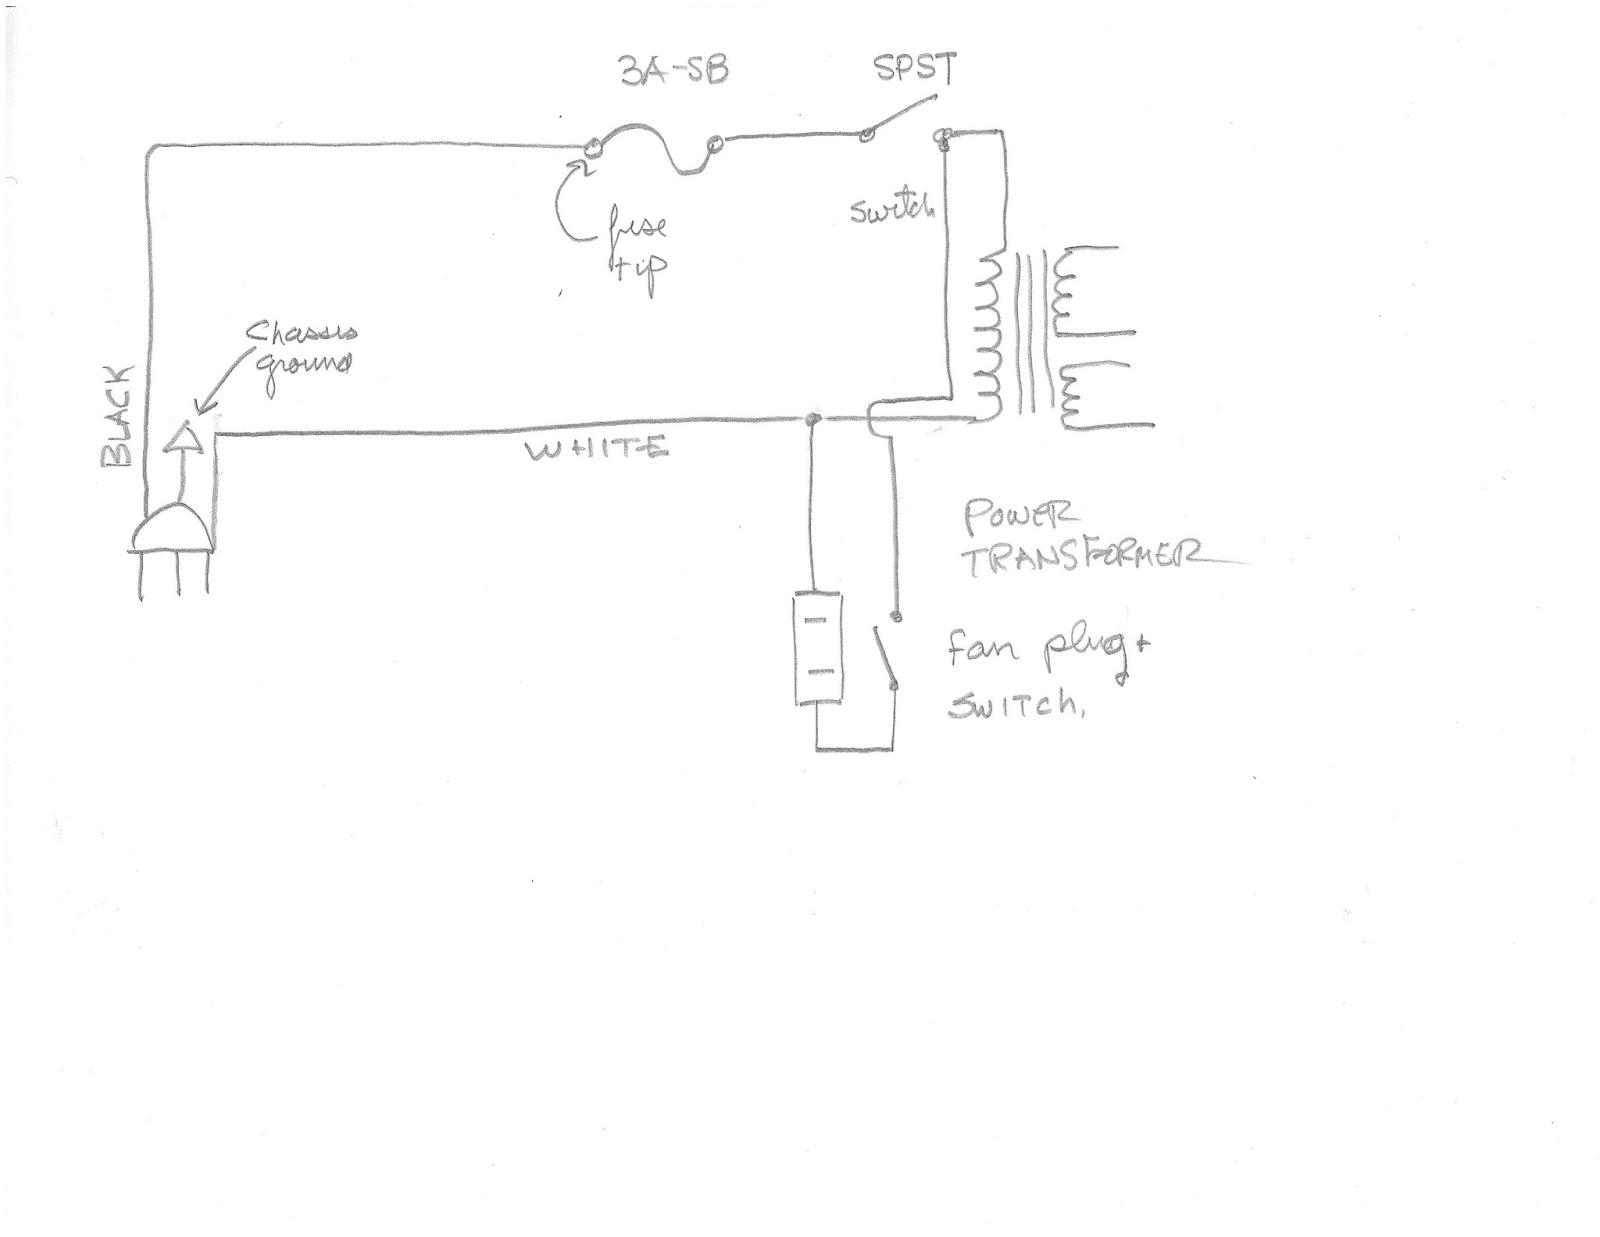 Judybox Revival Mesa Boogie Mark Ii Power Supply Wiring